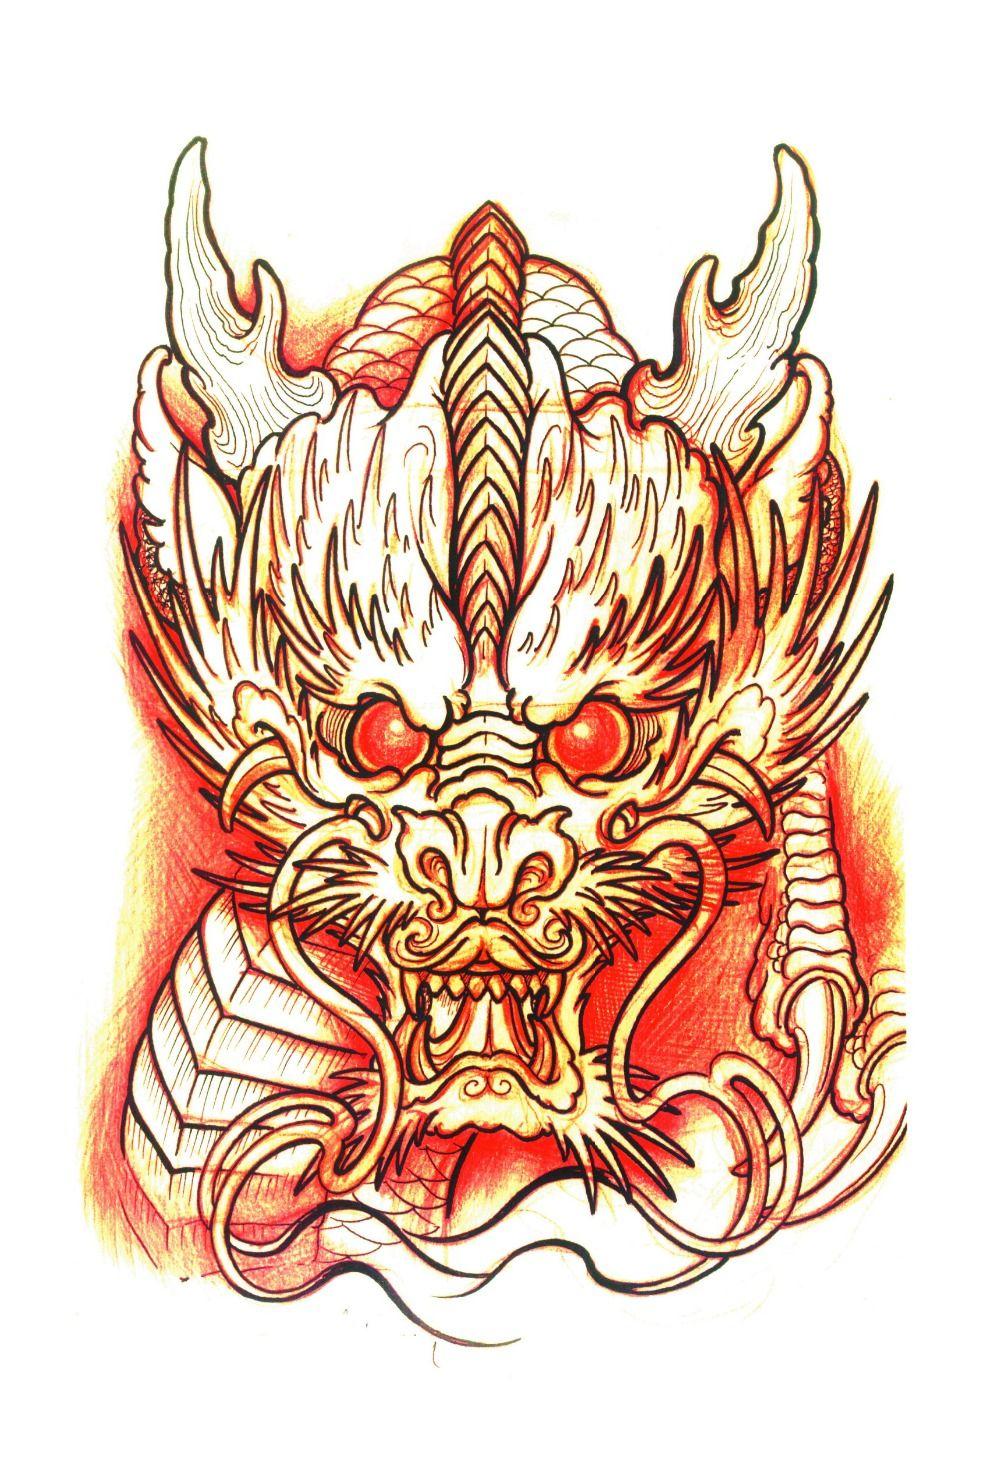 Aliexpress Com Buy Pdf Format Tattoo Book Drgaon Skull Hannya Ghost Eagletattoo Fudo Myo O Tattoo Flash Book Tattoo Des Flash Tattoo Book Tattoo Sketch Free